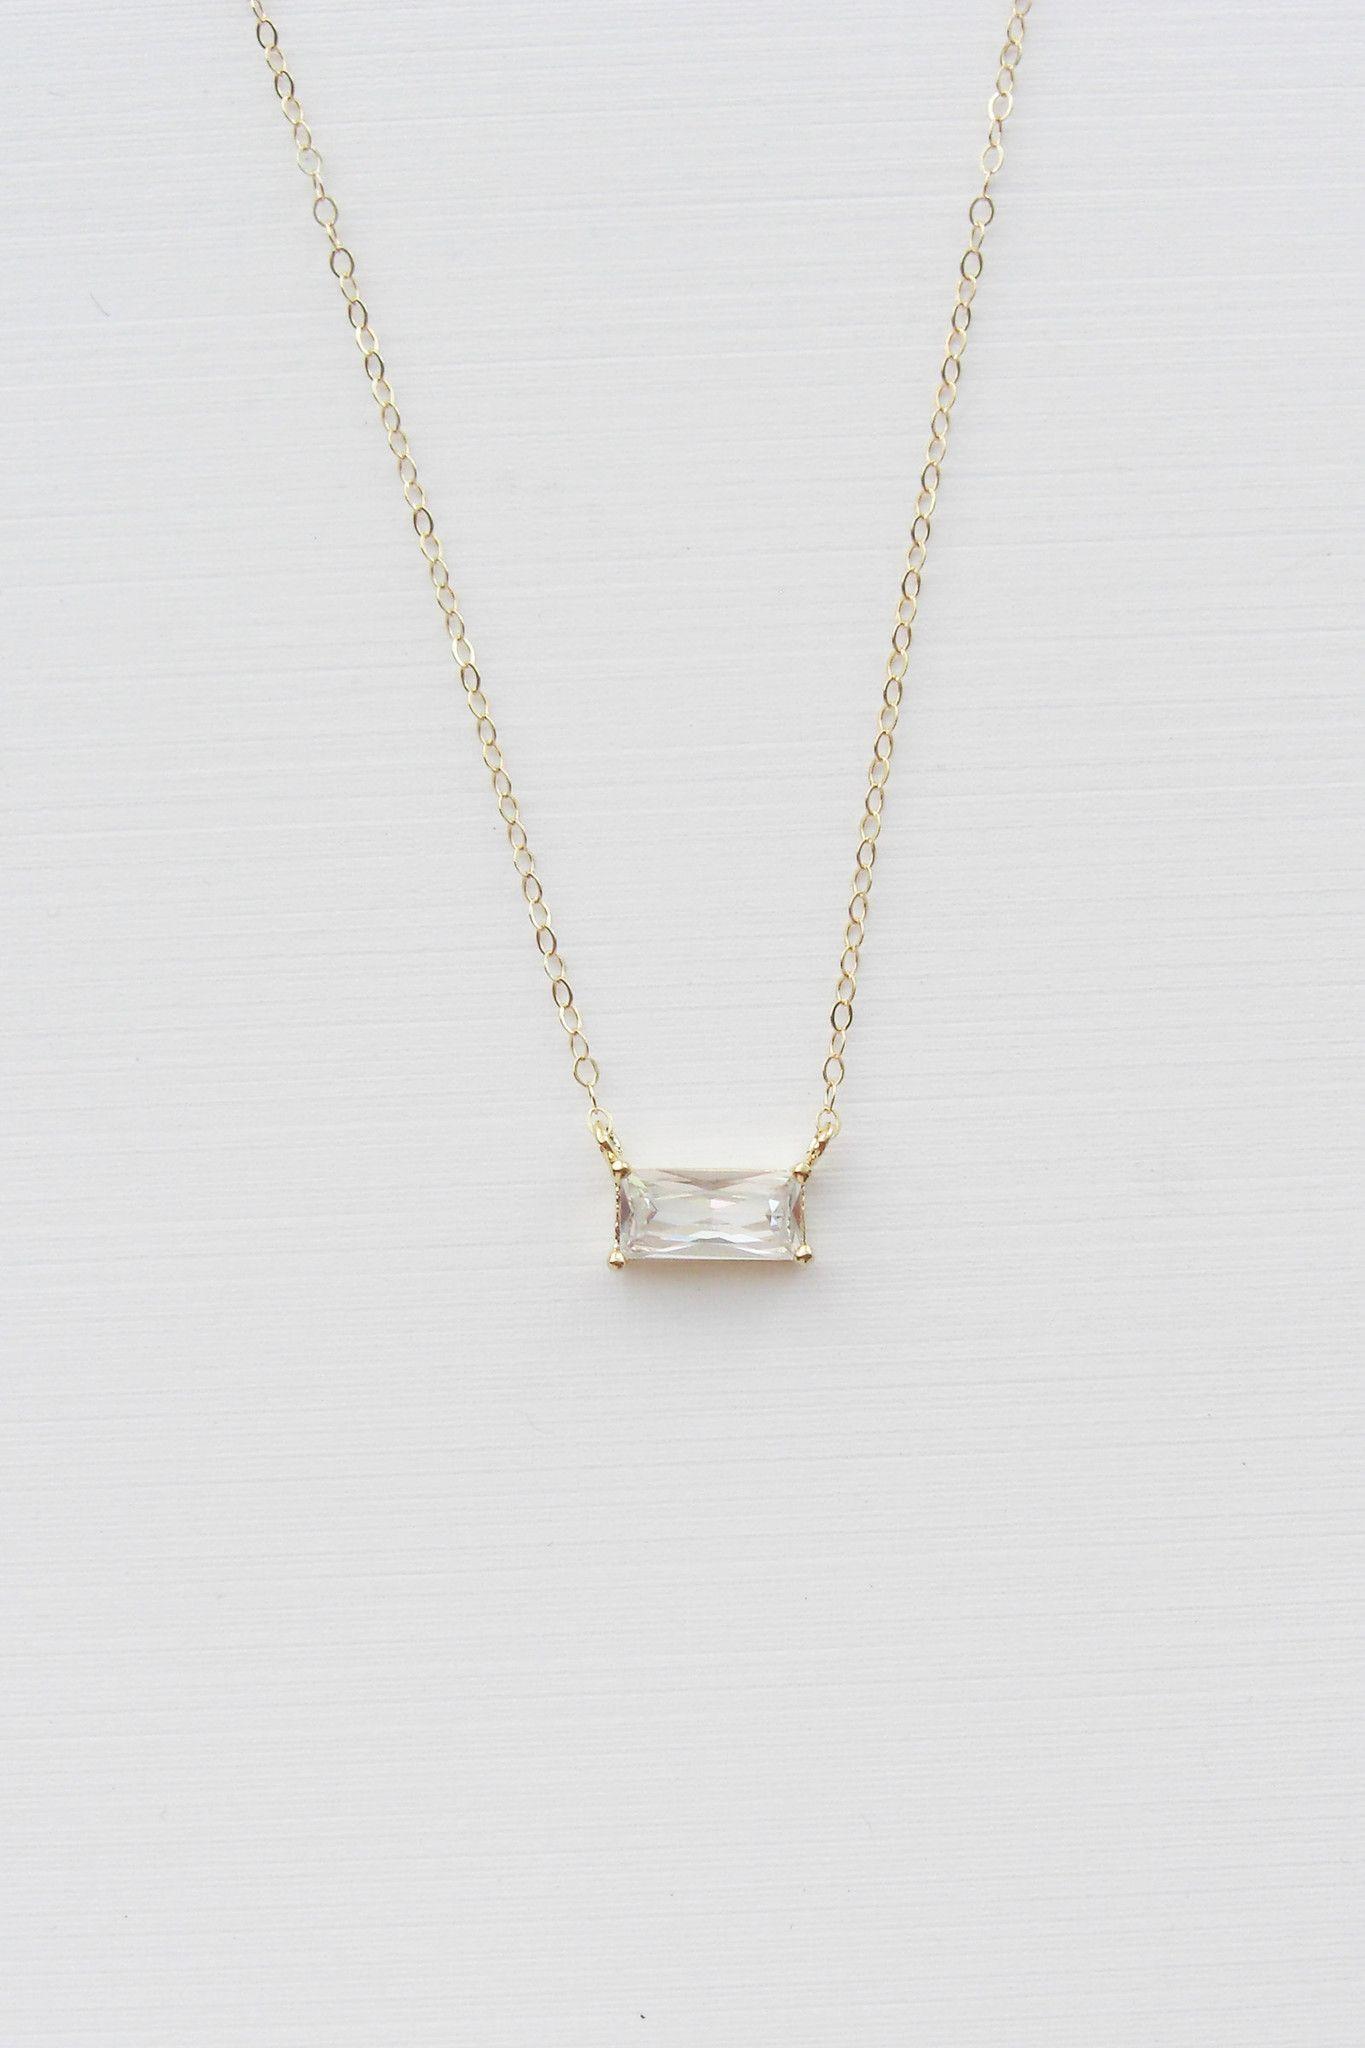 Minimalist Baguette Necklace Christine Elizabeth Jewelry